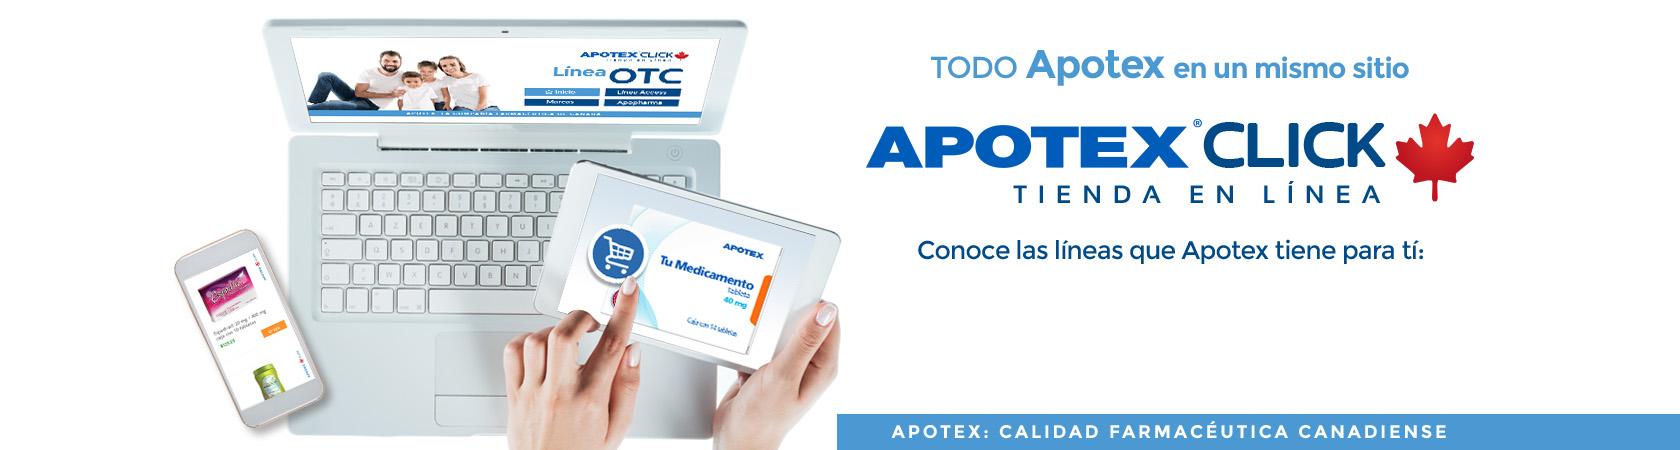 Homepage_Apotex_1680x400